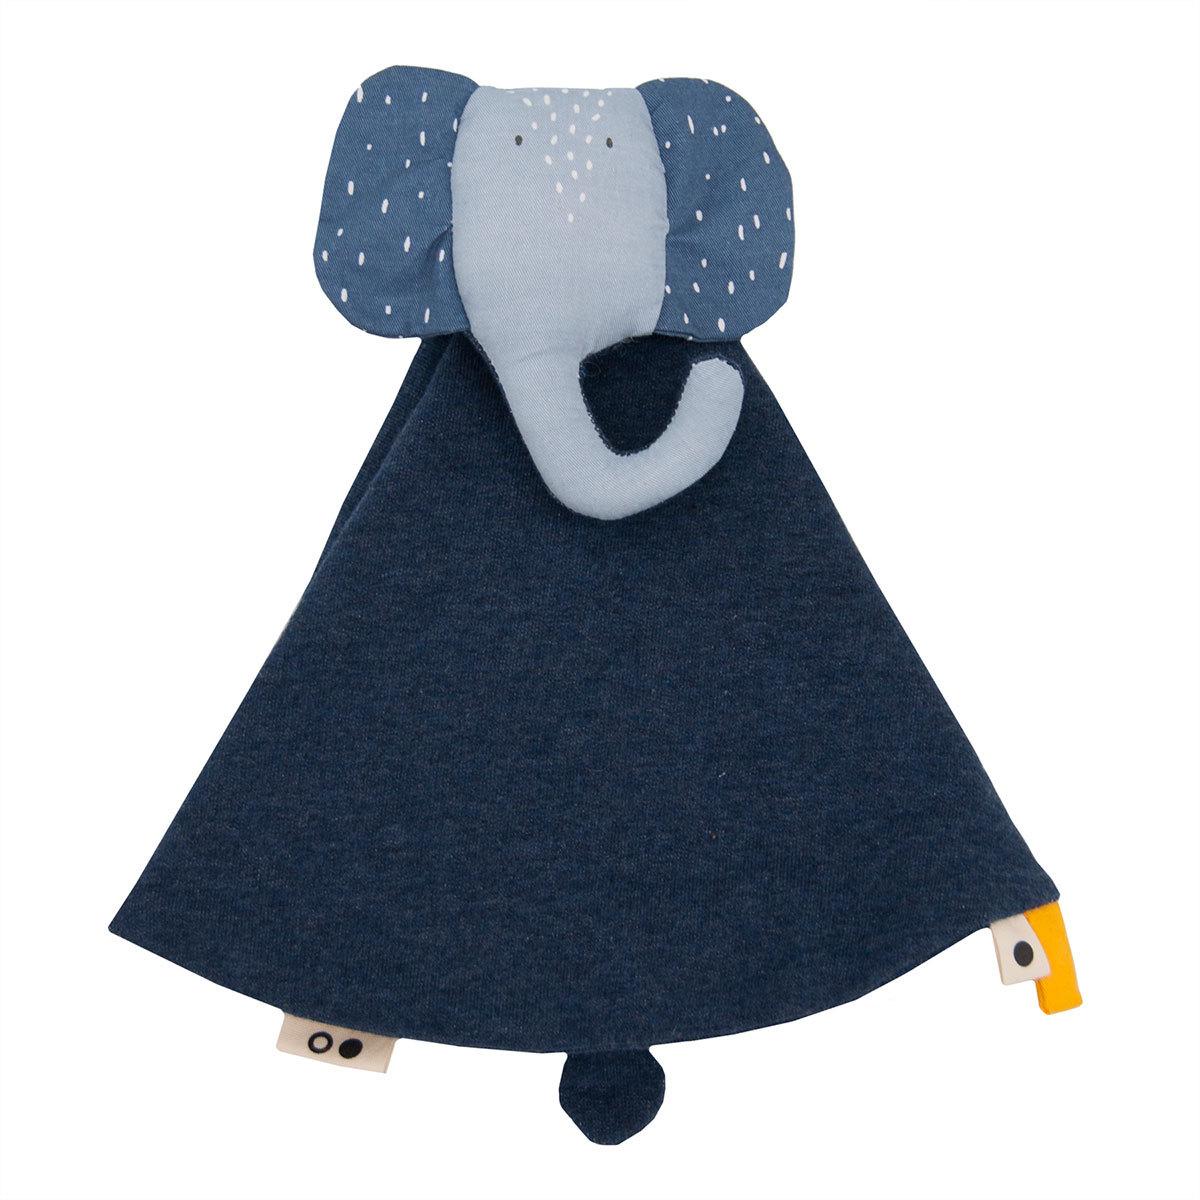 Doudou Doudou - Mrs. Elephant Doudou - Mrs. Elephant